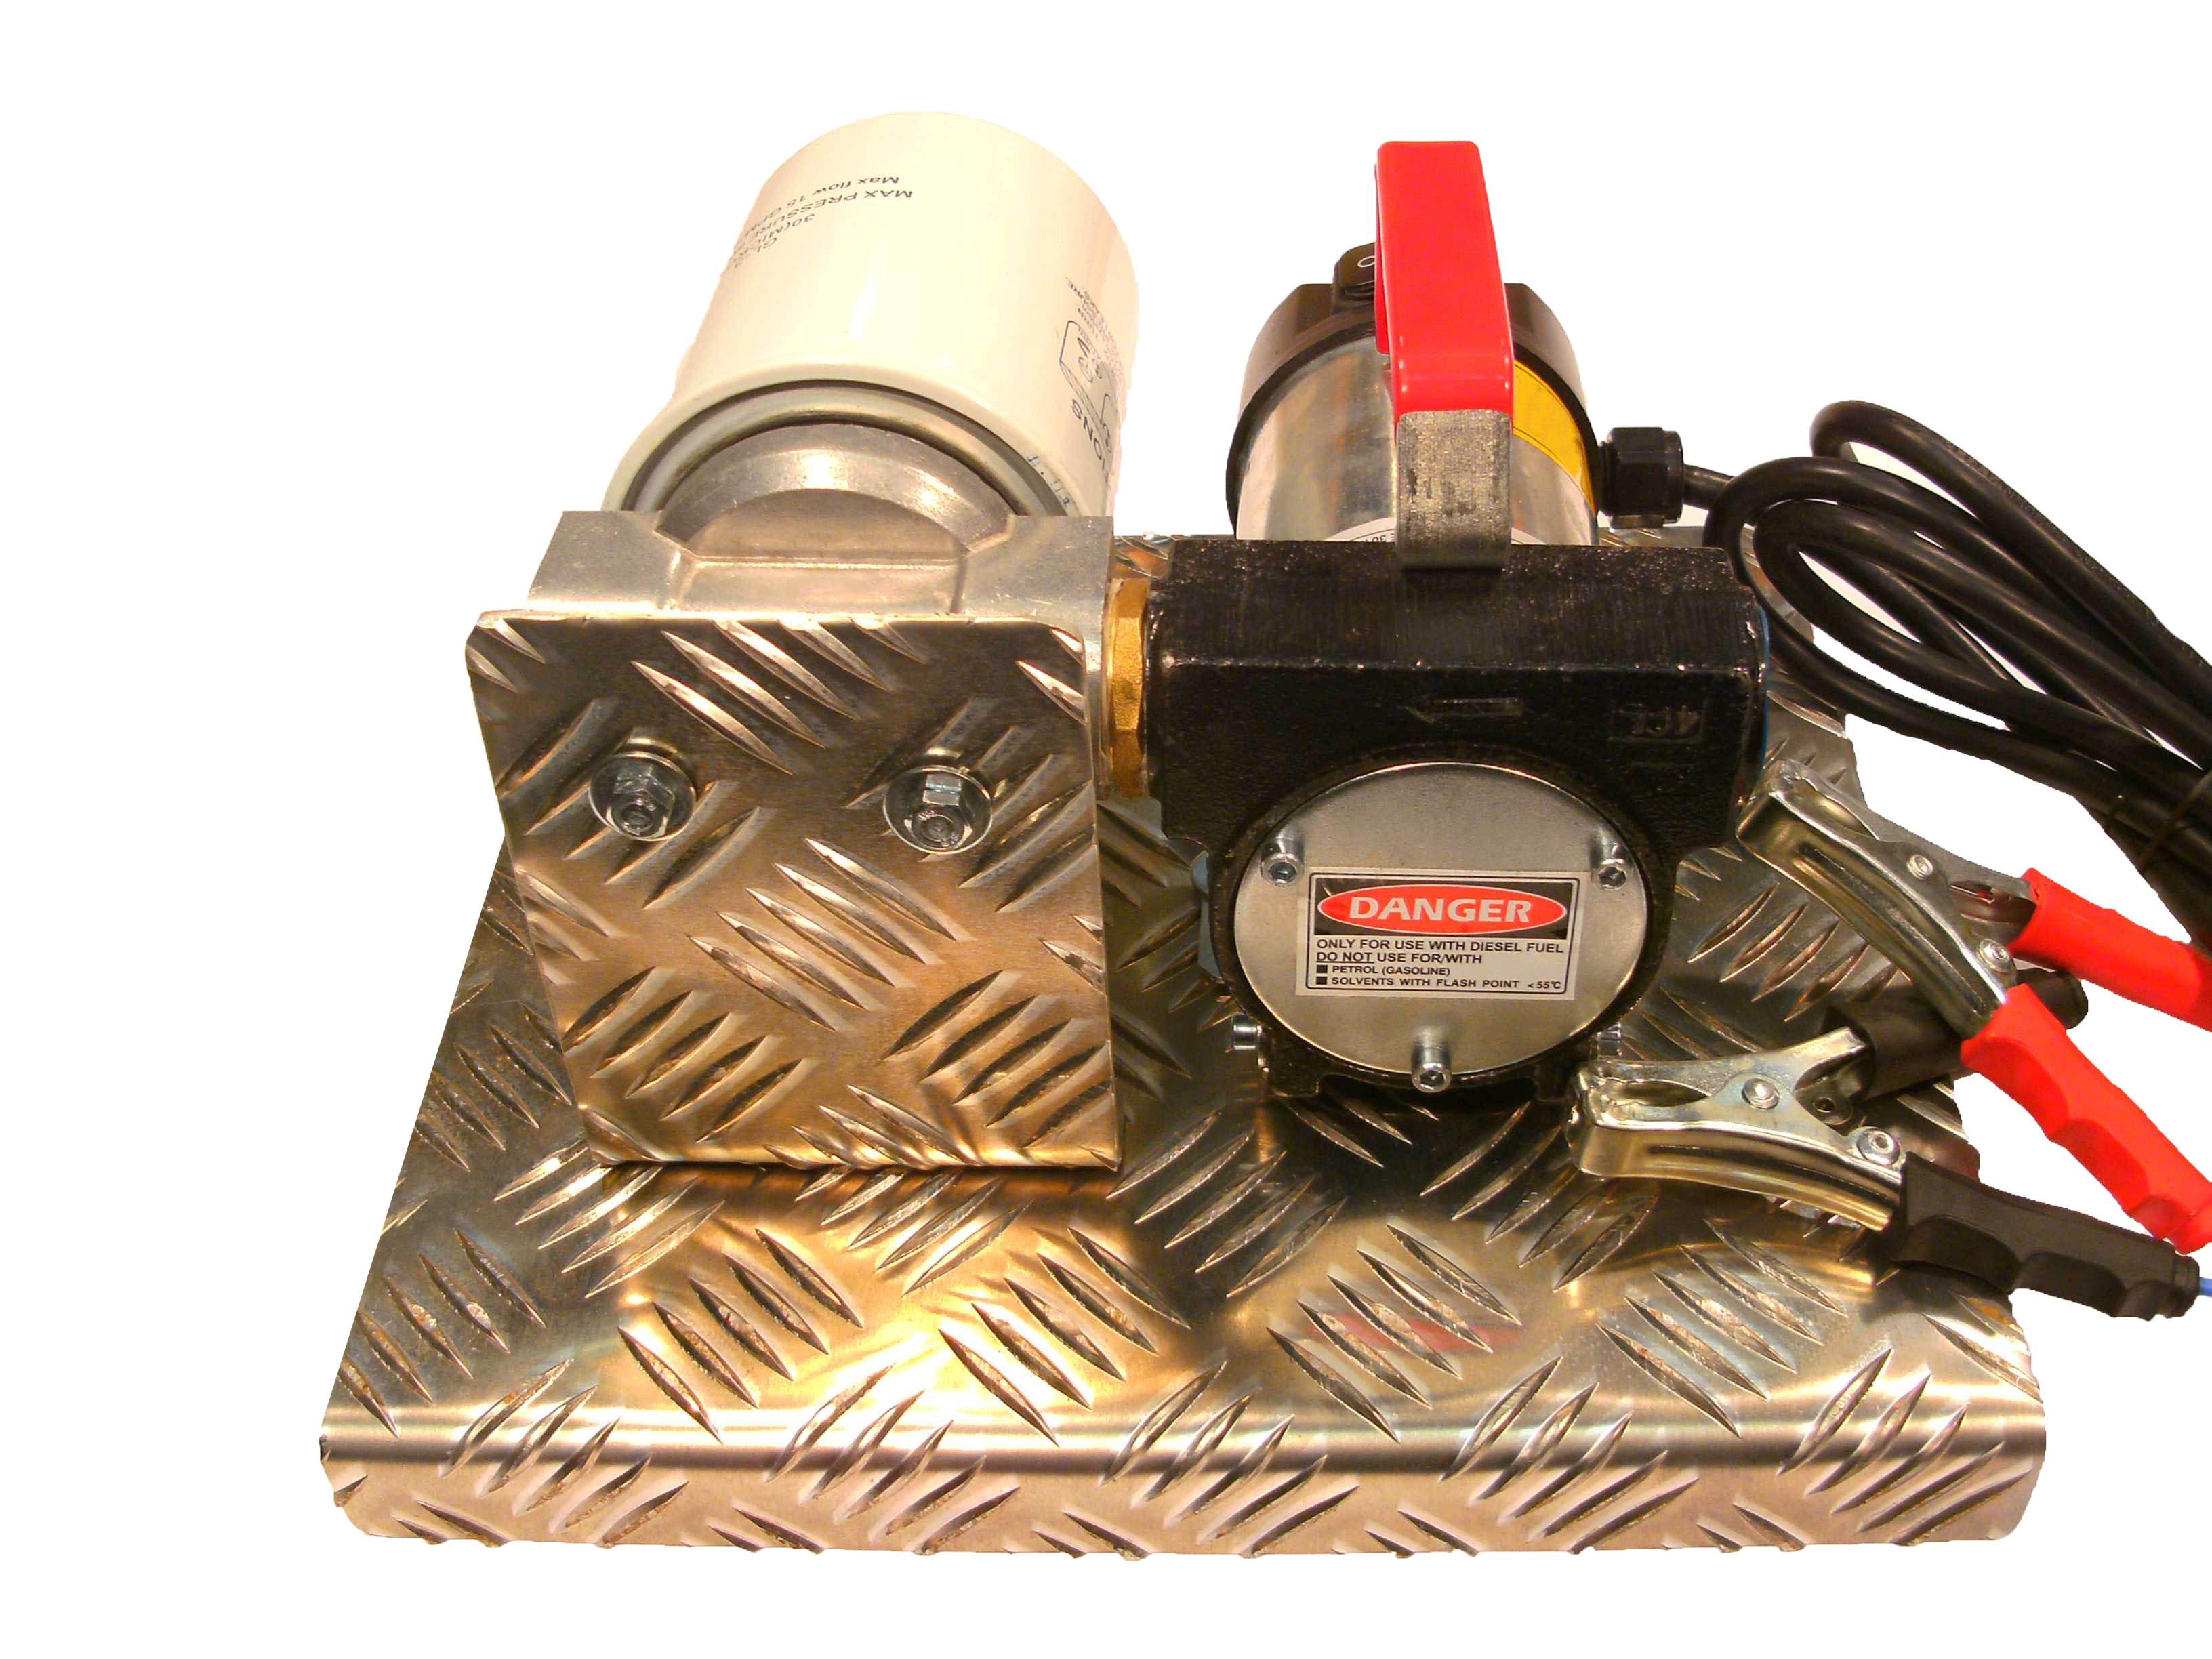 24 v pumpe diesel lfilter bauhof dieselfilter ltank heiz l reinigen heiz ltank. Black Bedroom Furniture Sets. Home Design Ideas